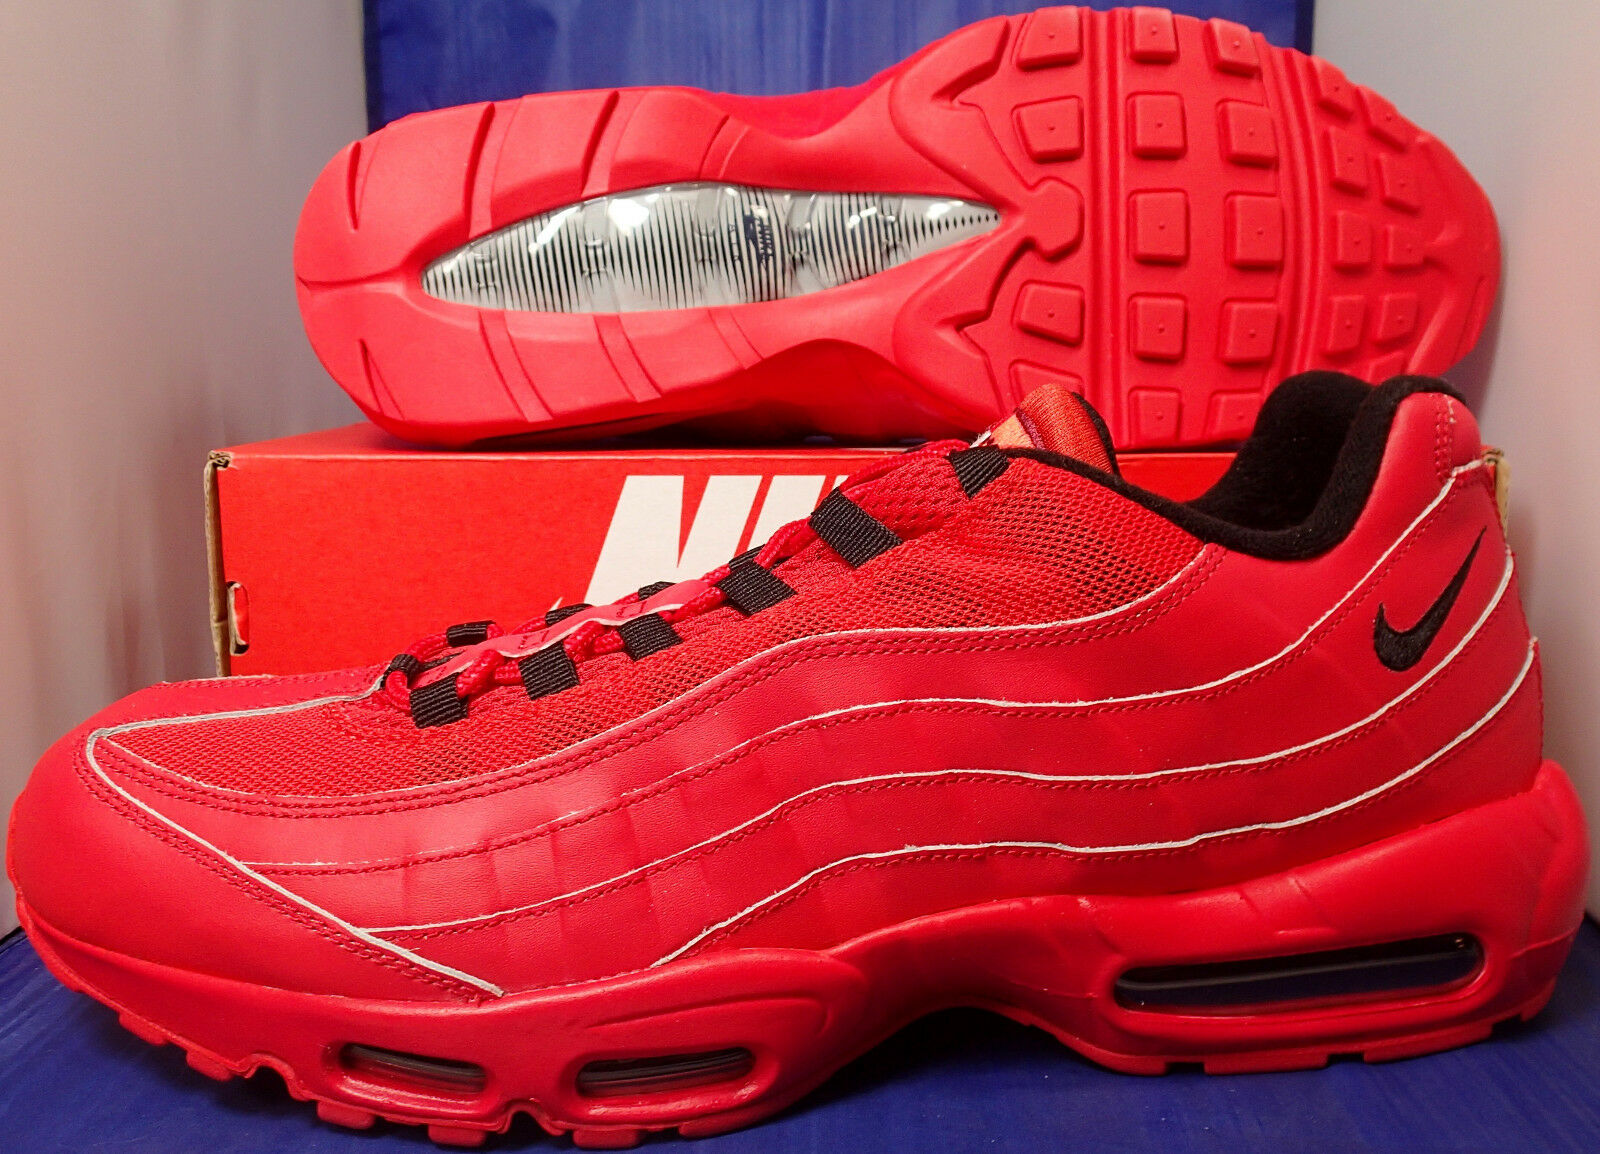 Nike Air Max 95 iD University Red Black SZ 15 ( 818592-992 )